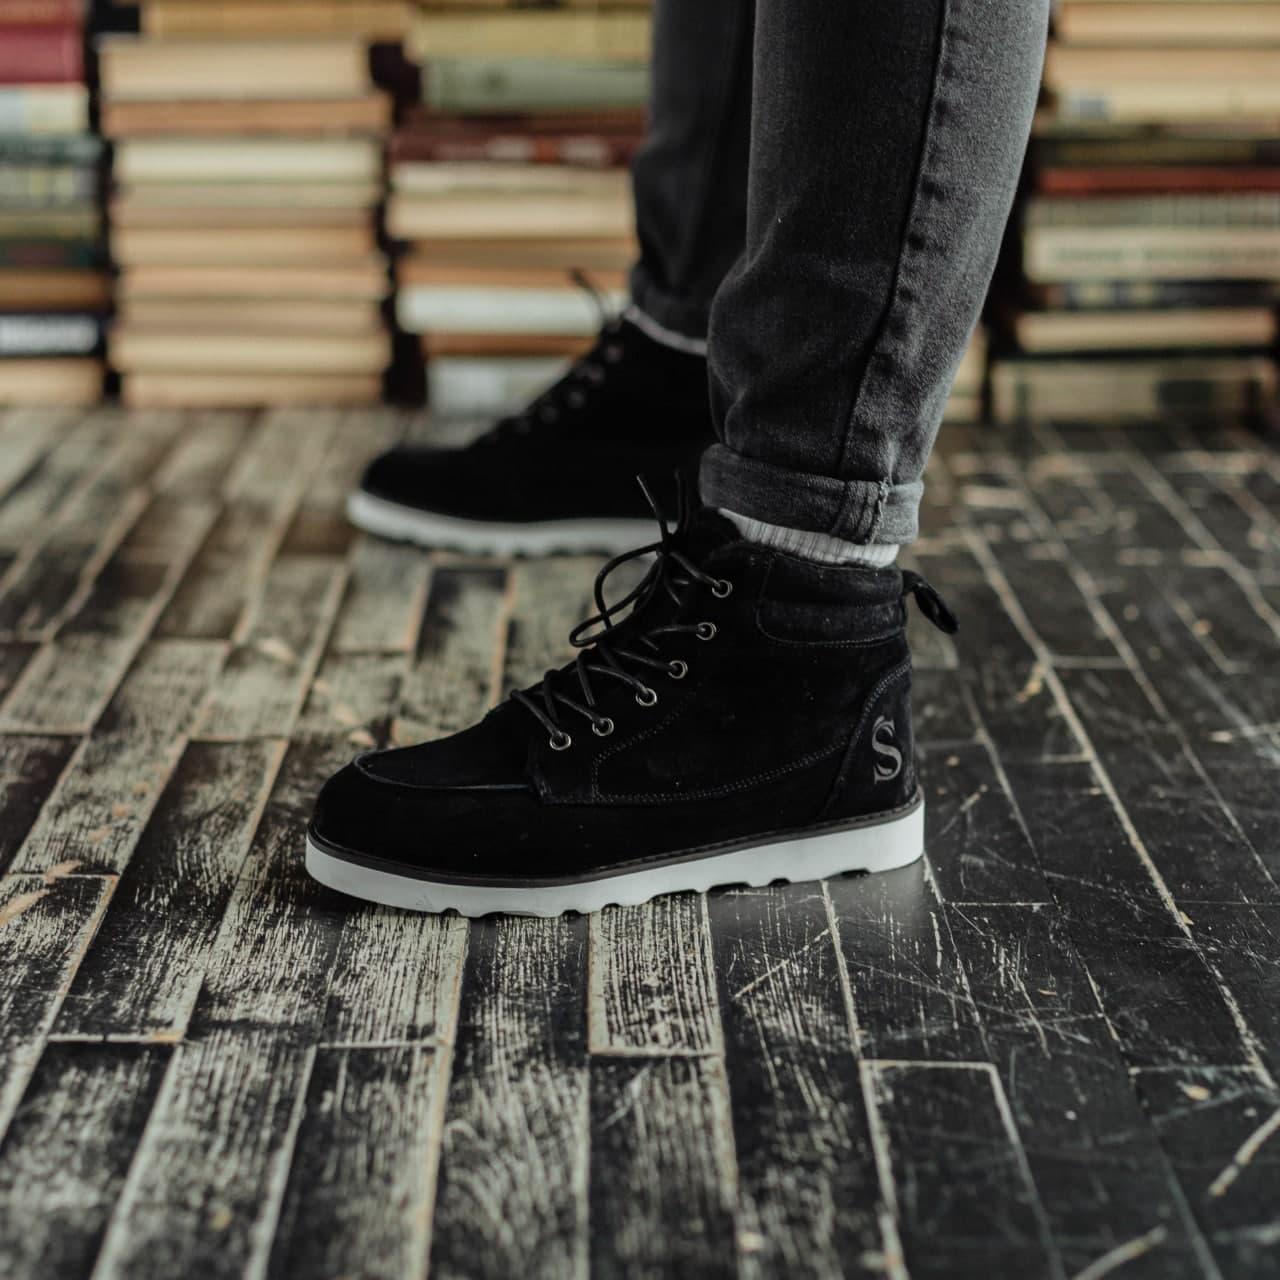 Ботинки South indigo black